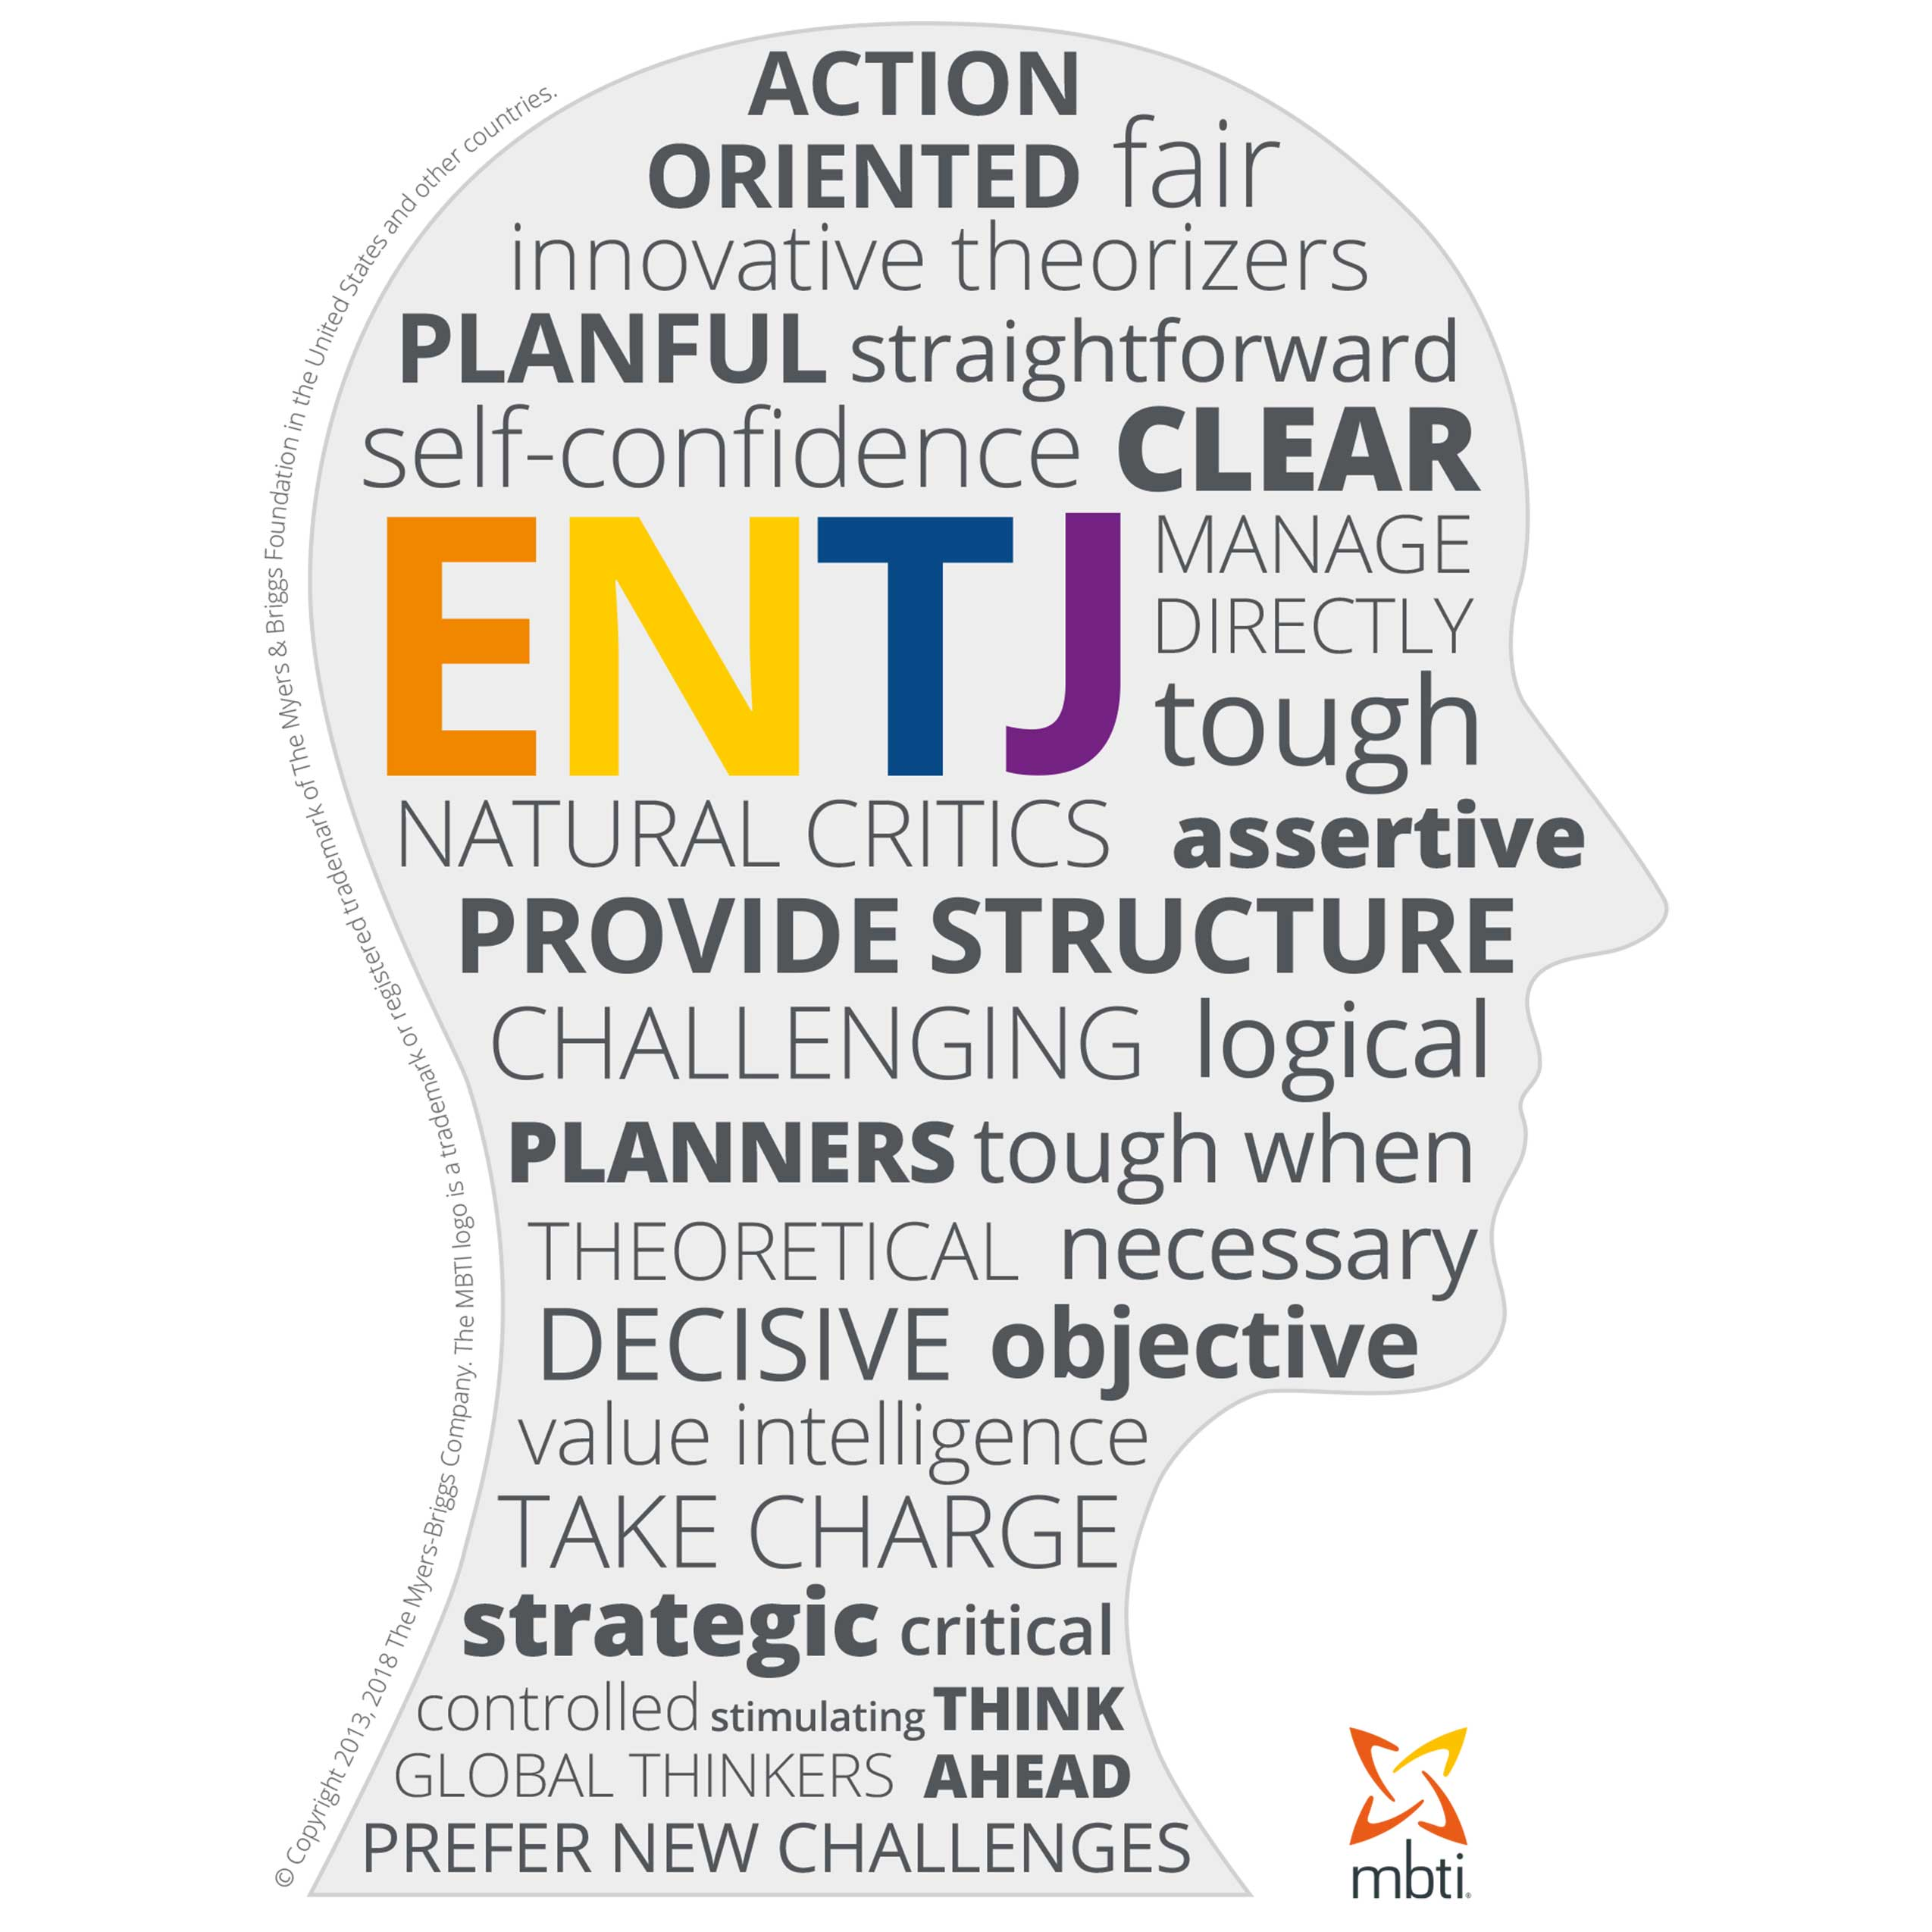 MBTI Myers-Briggs Personality Type Characteristics ENTJ